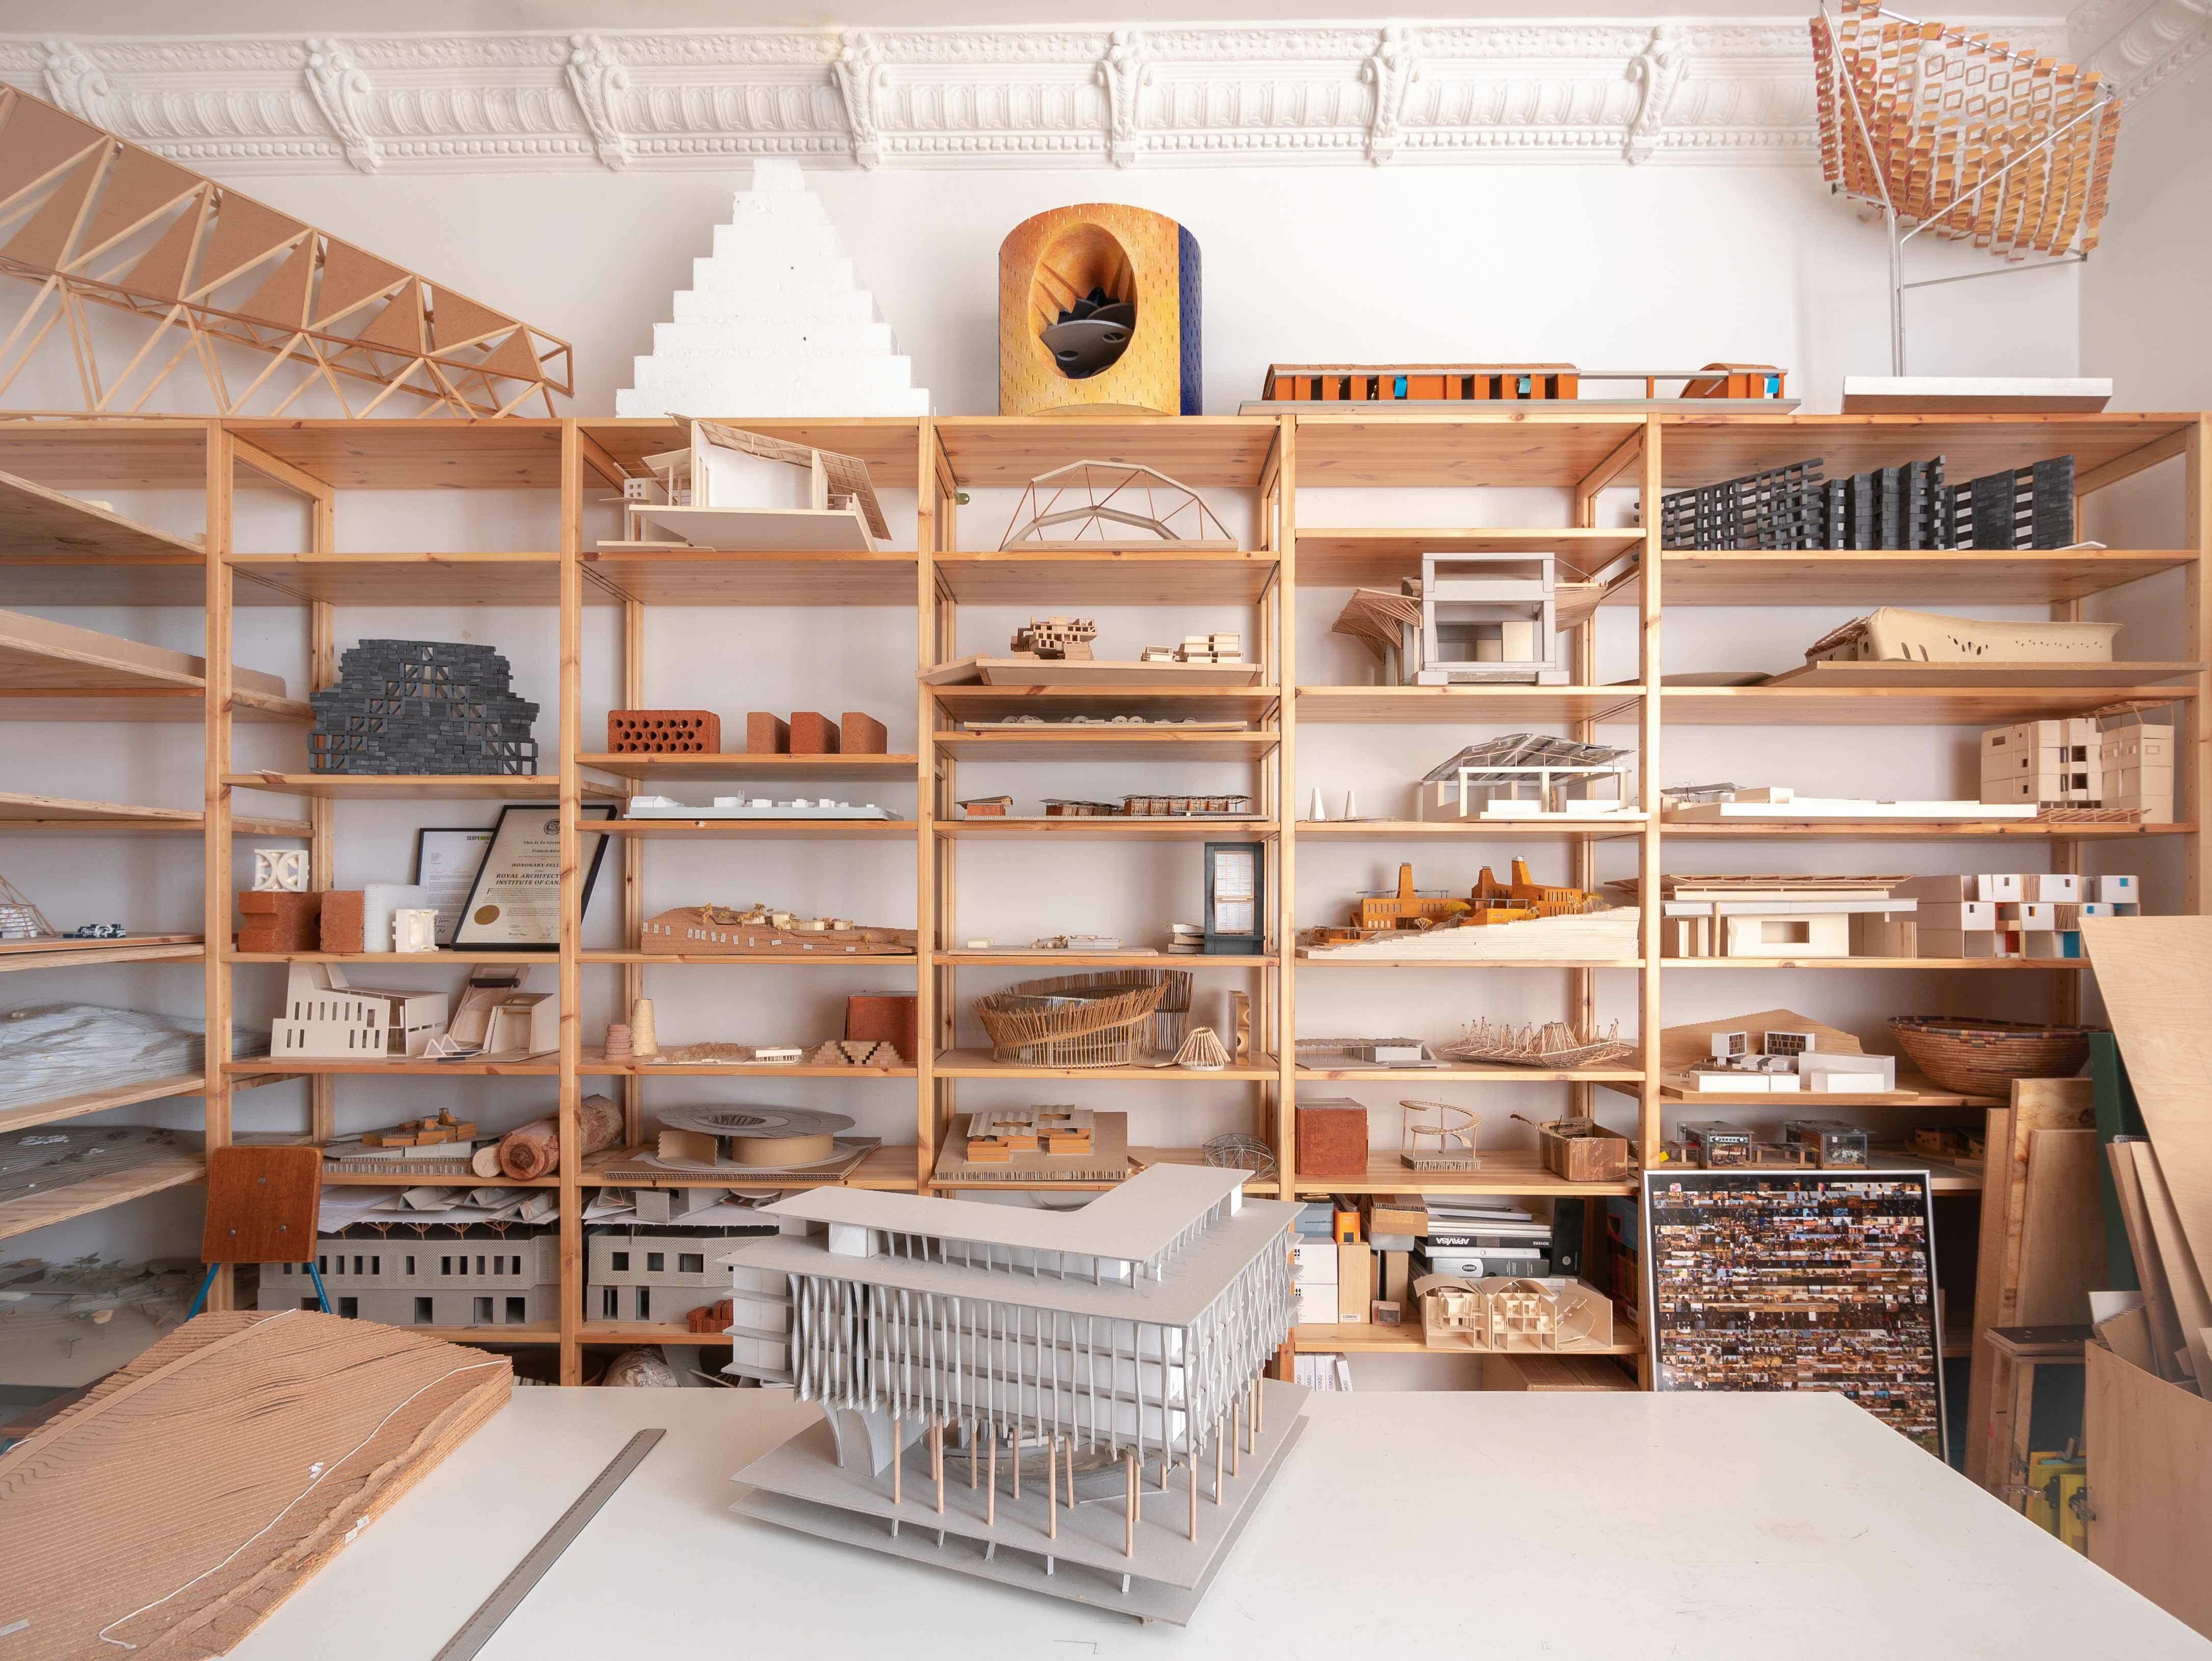 Workshop At Kéré Architecture Studio In Berlin